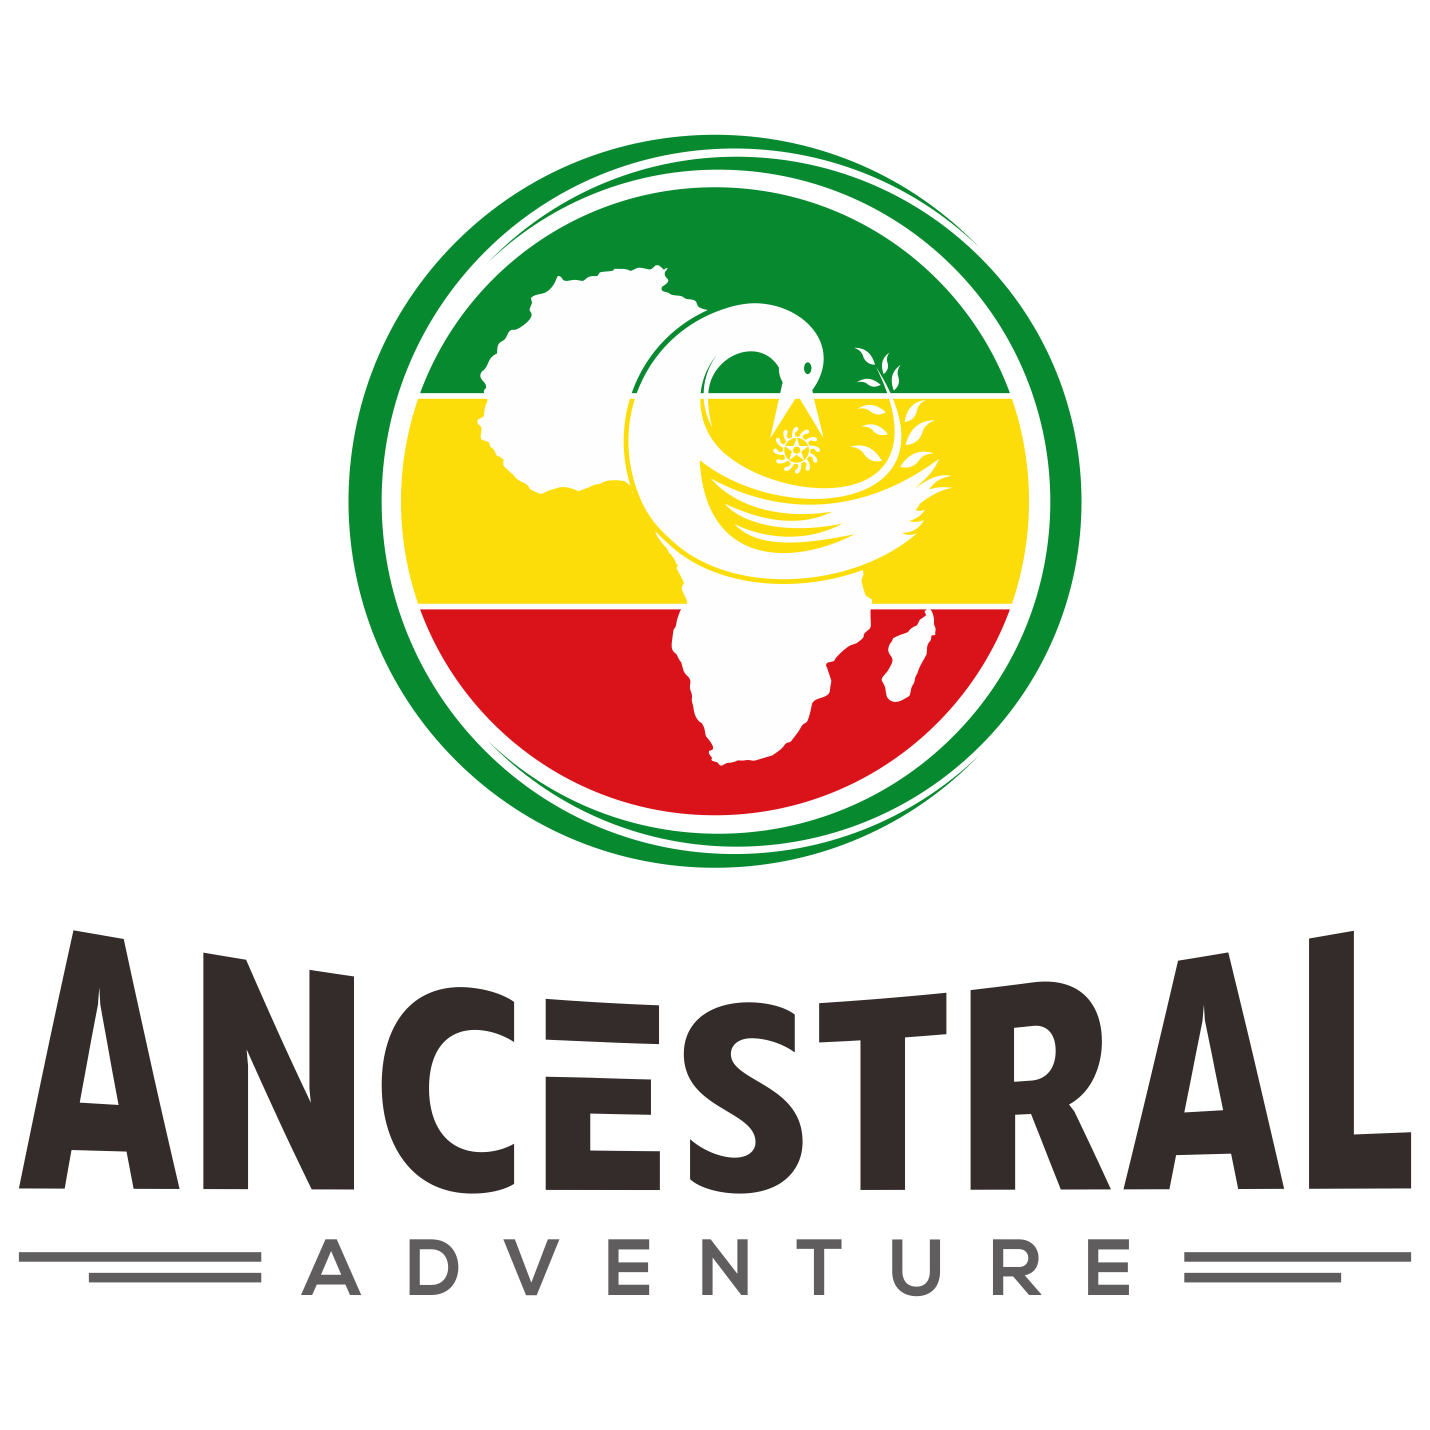 Ancestral Adventures